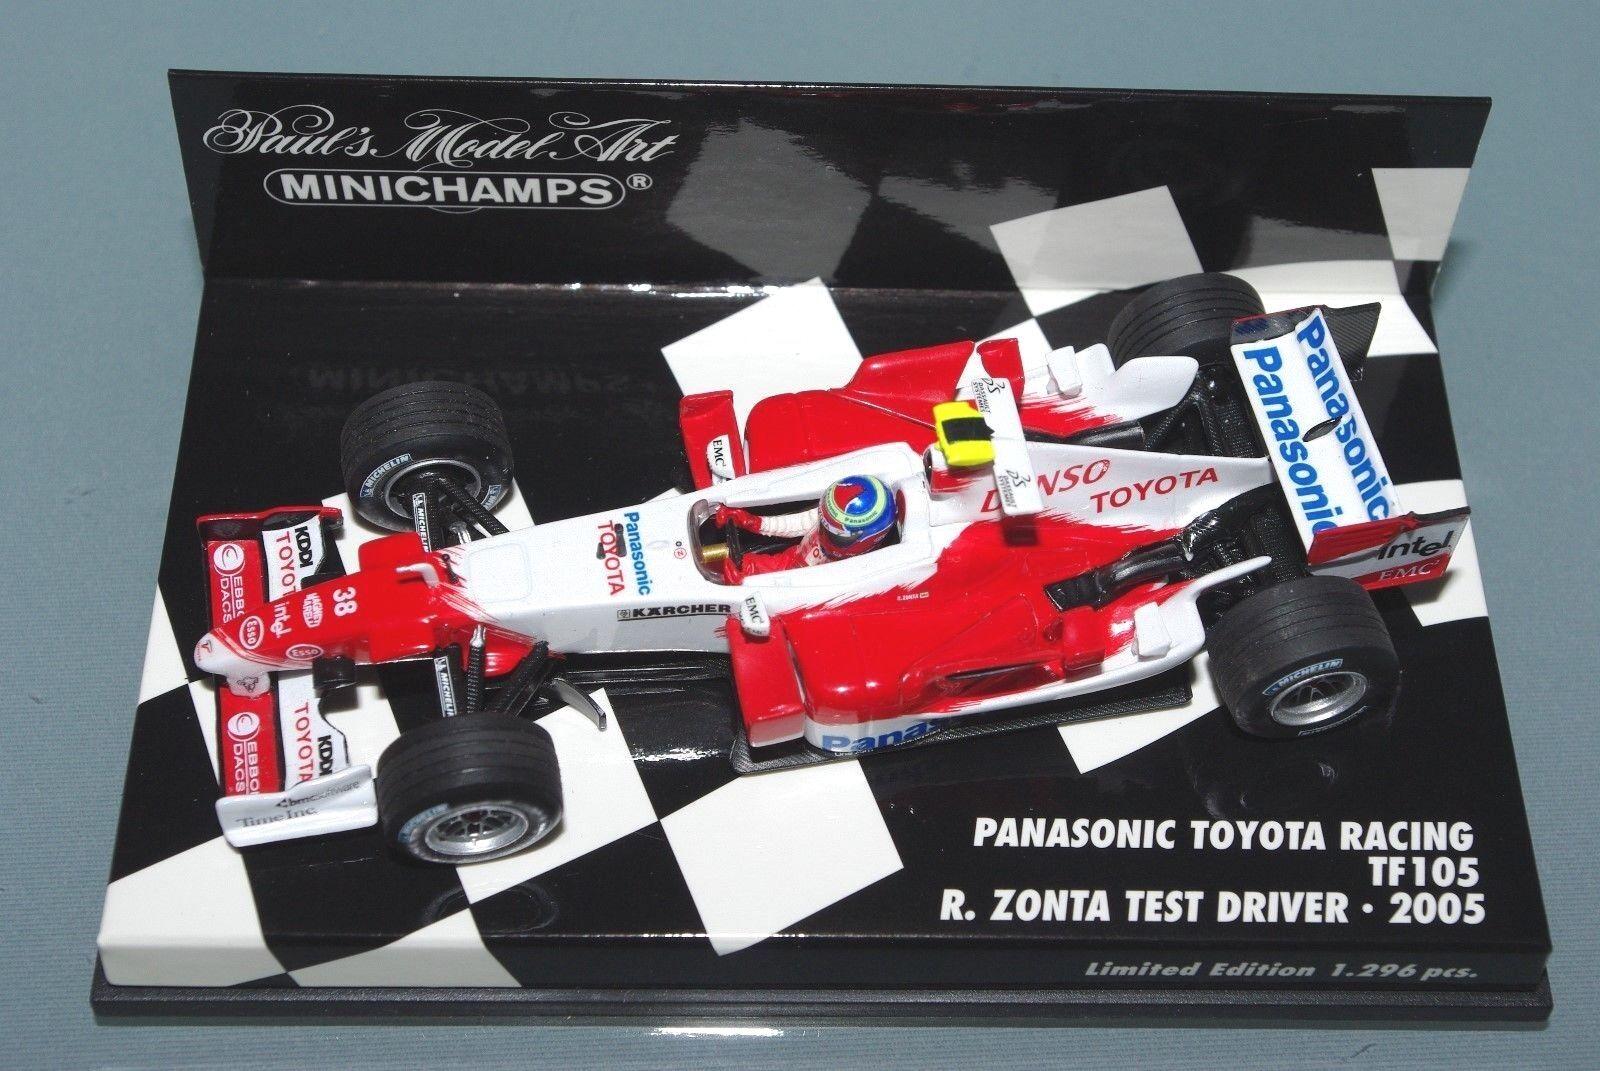 Minichamps F1 1 43 PANASONIC TOYOTA RACING TF105 RICARDO ZONTA TEST DRIVER 2005